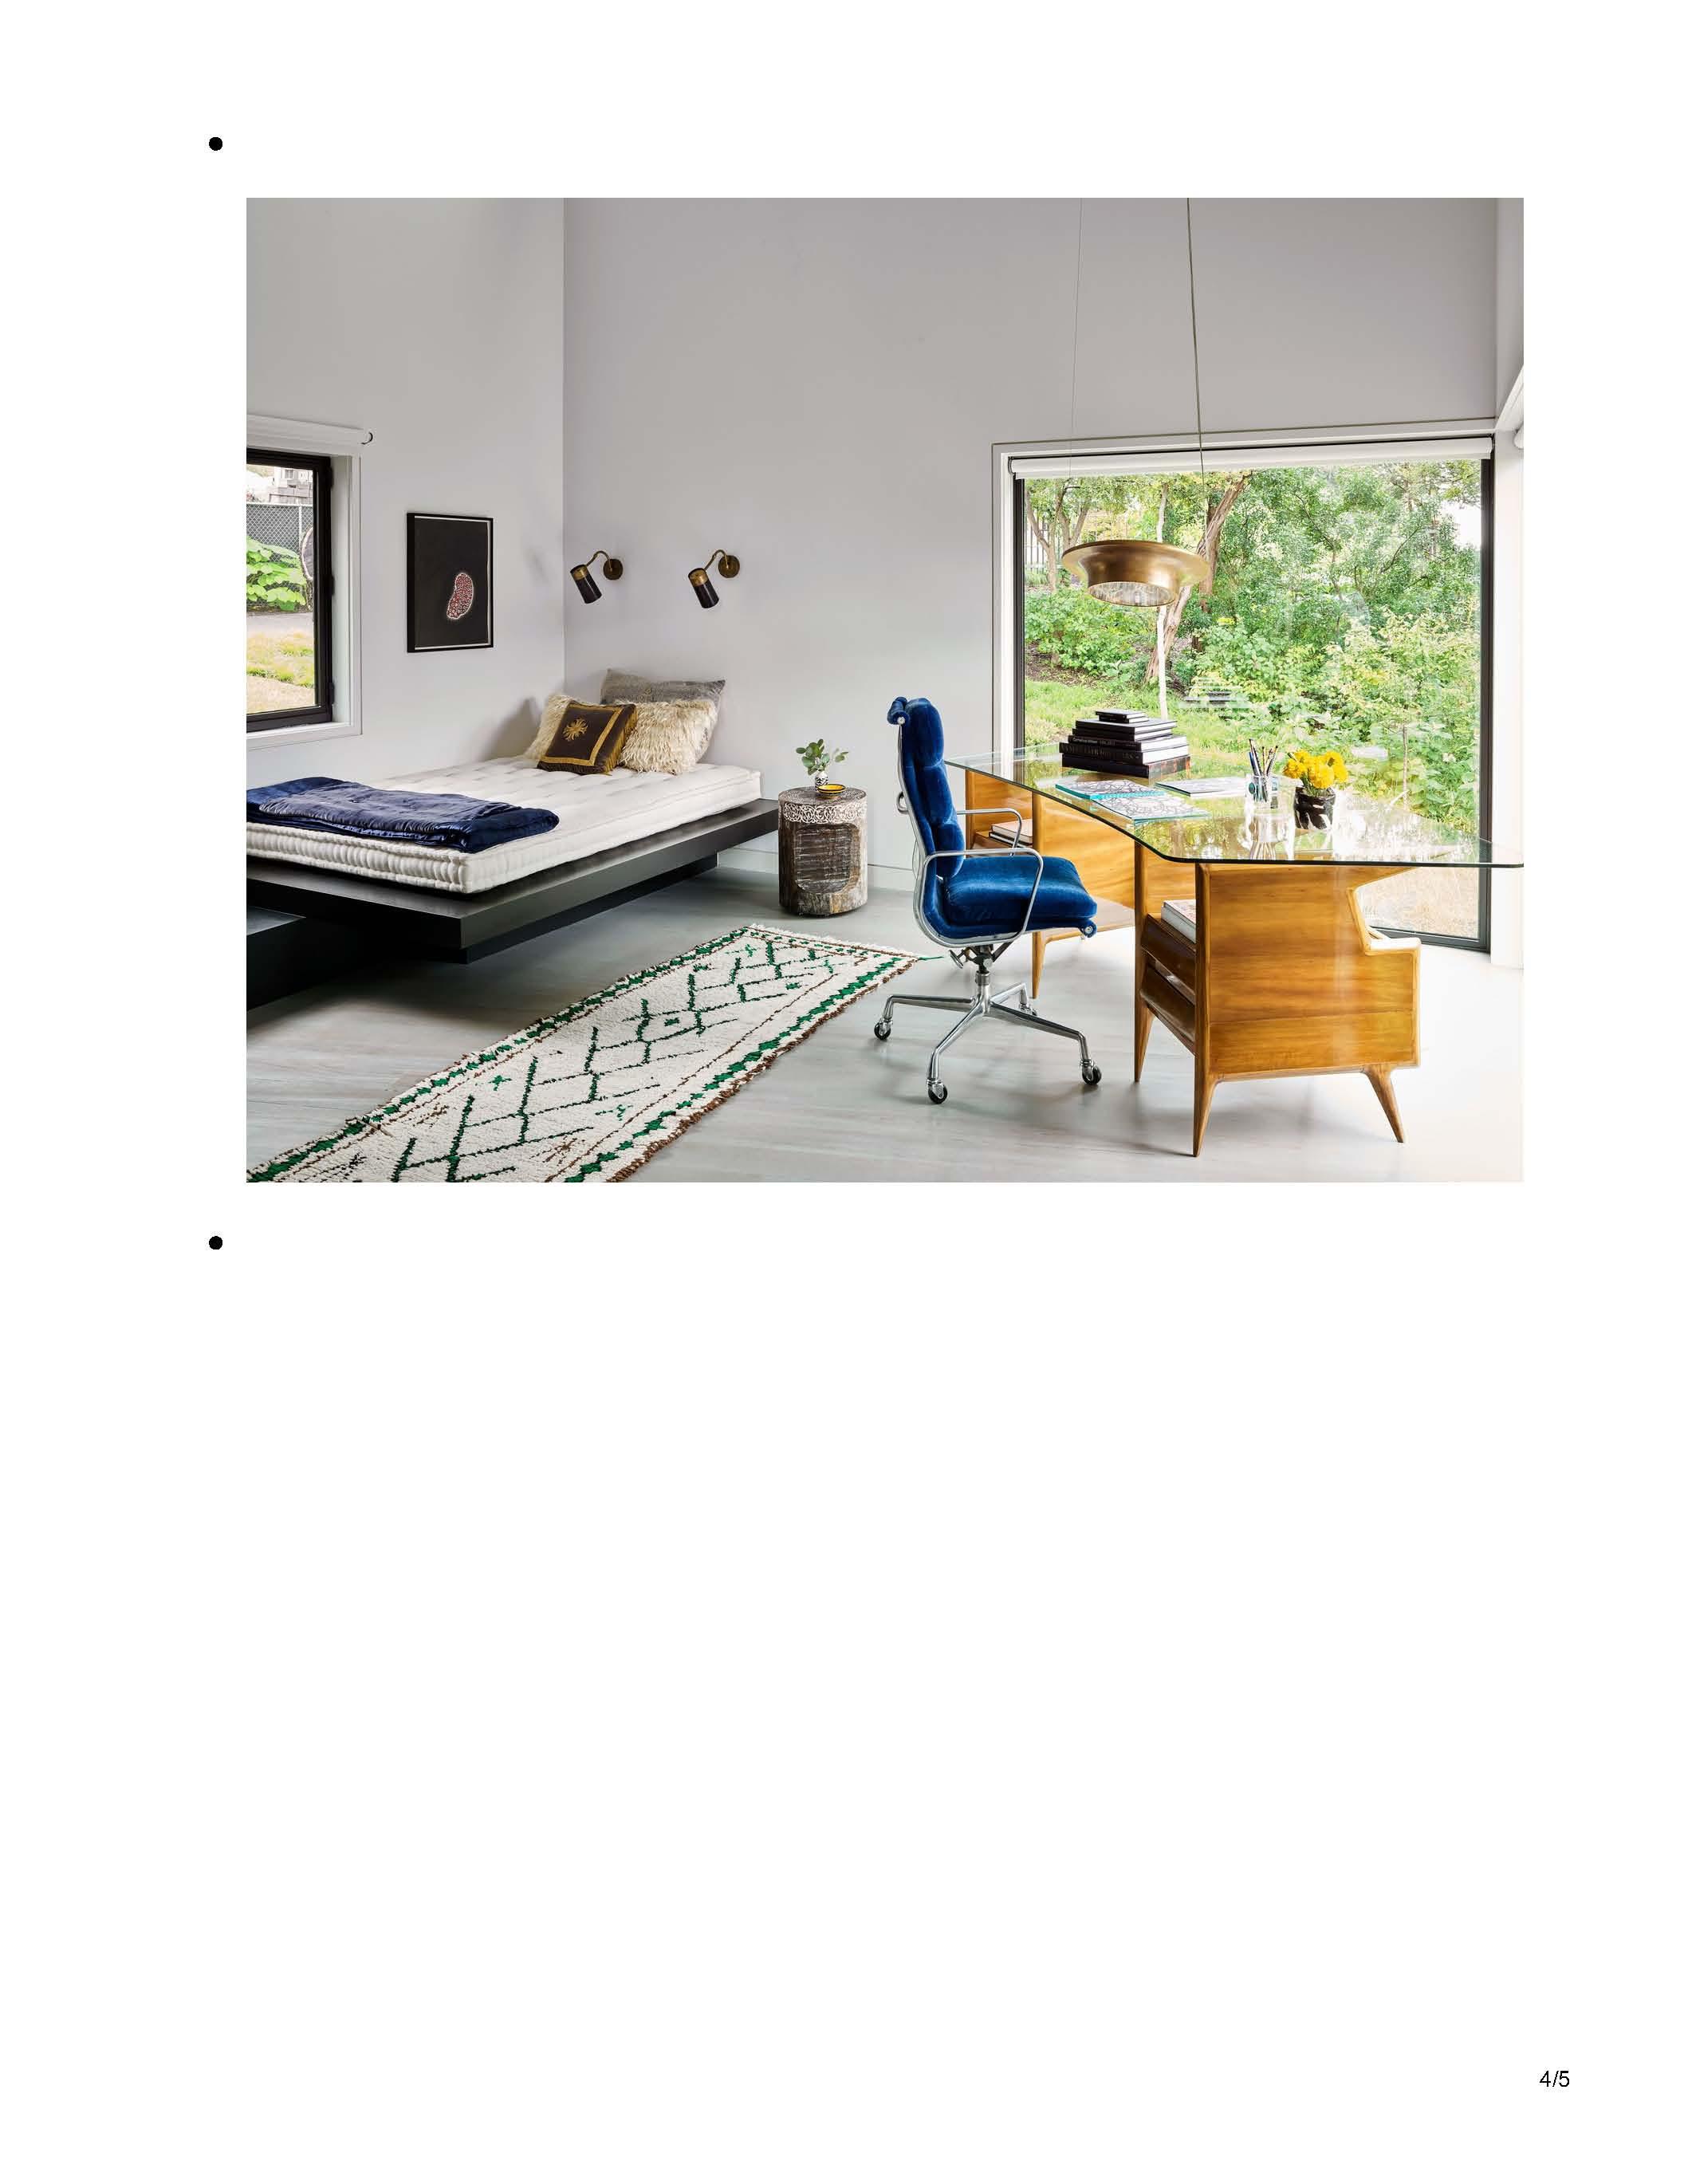 architecturaldigest.com-A Statement-Making Austin Home With a World-Clas..._Page_4.jpg